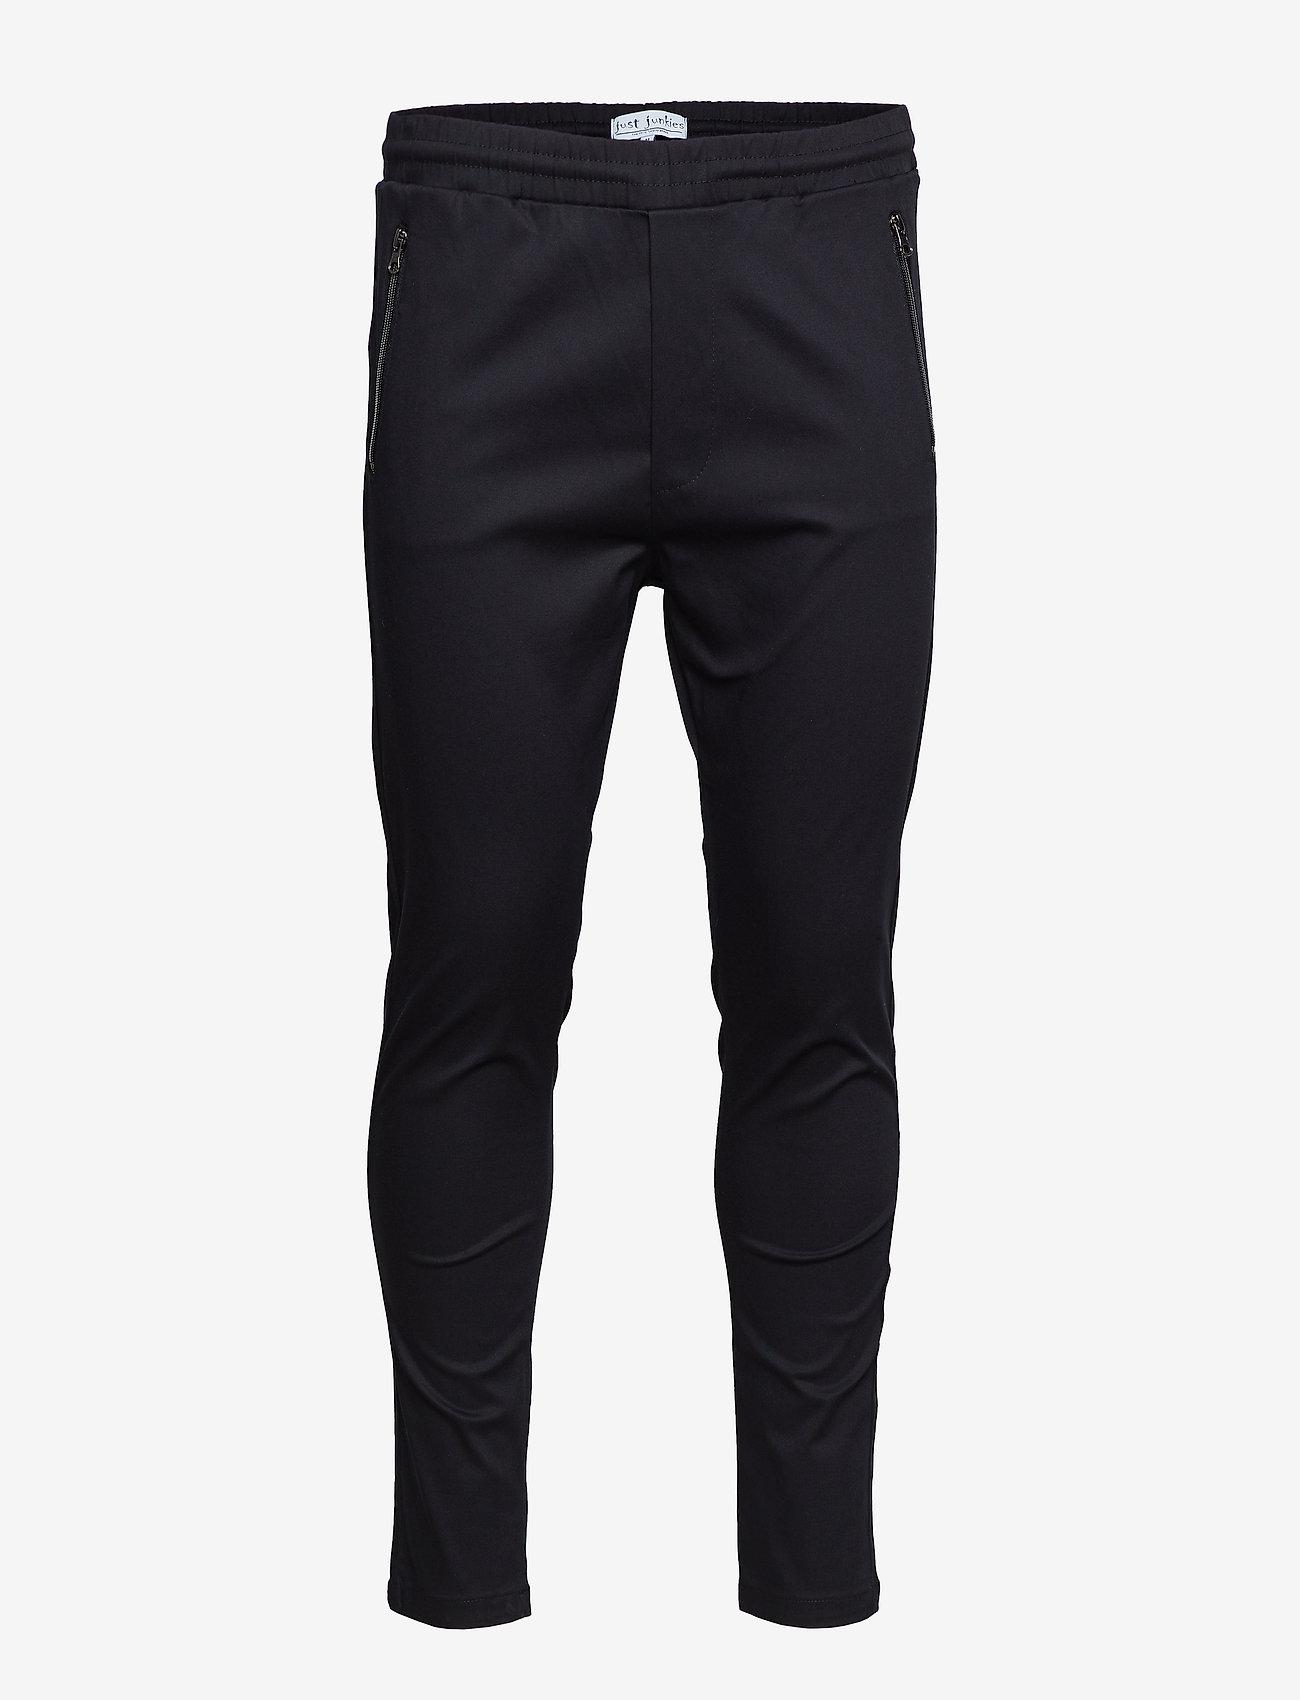 Just Junkies - Flex 2.0 - spodnie na co dzień - black - 0